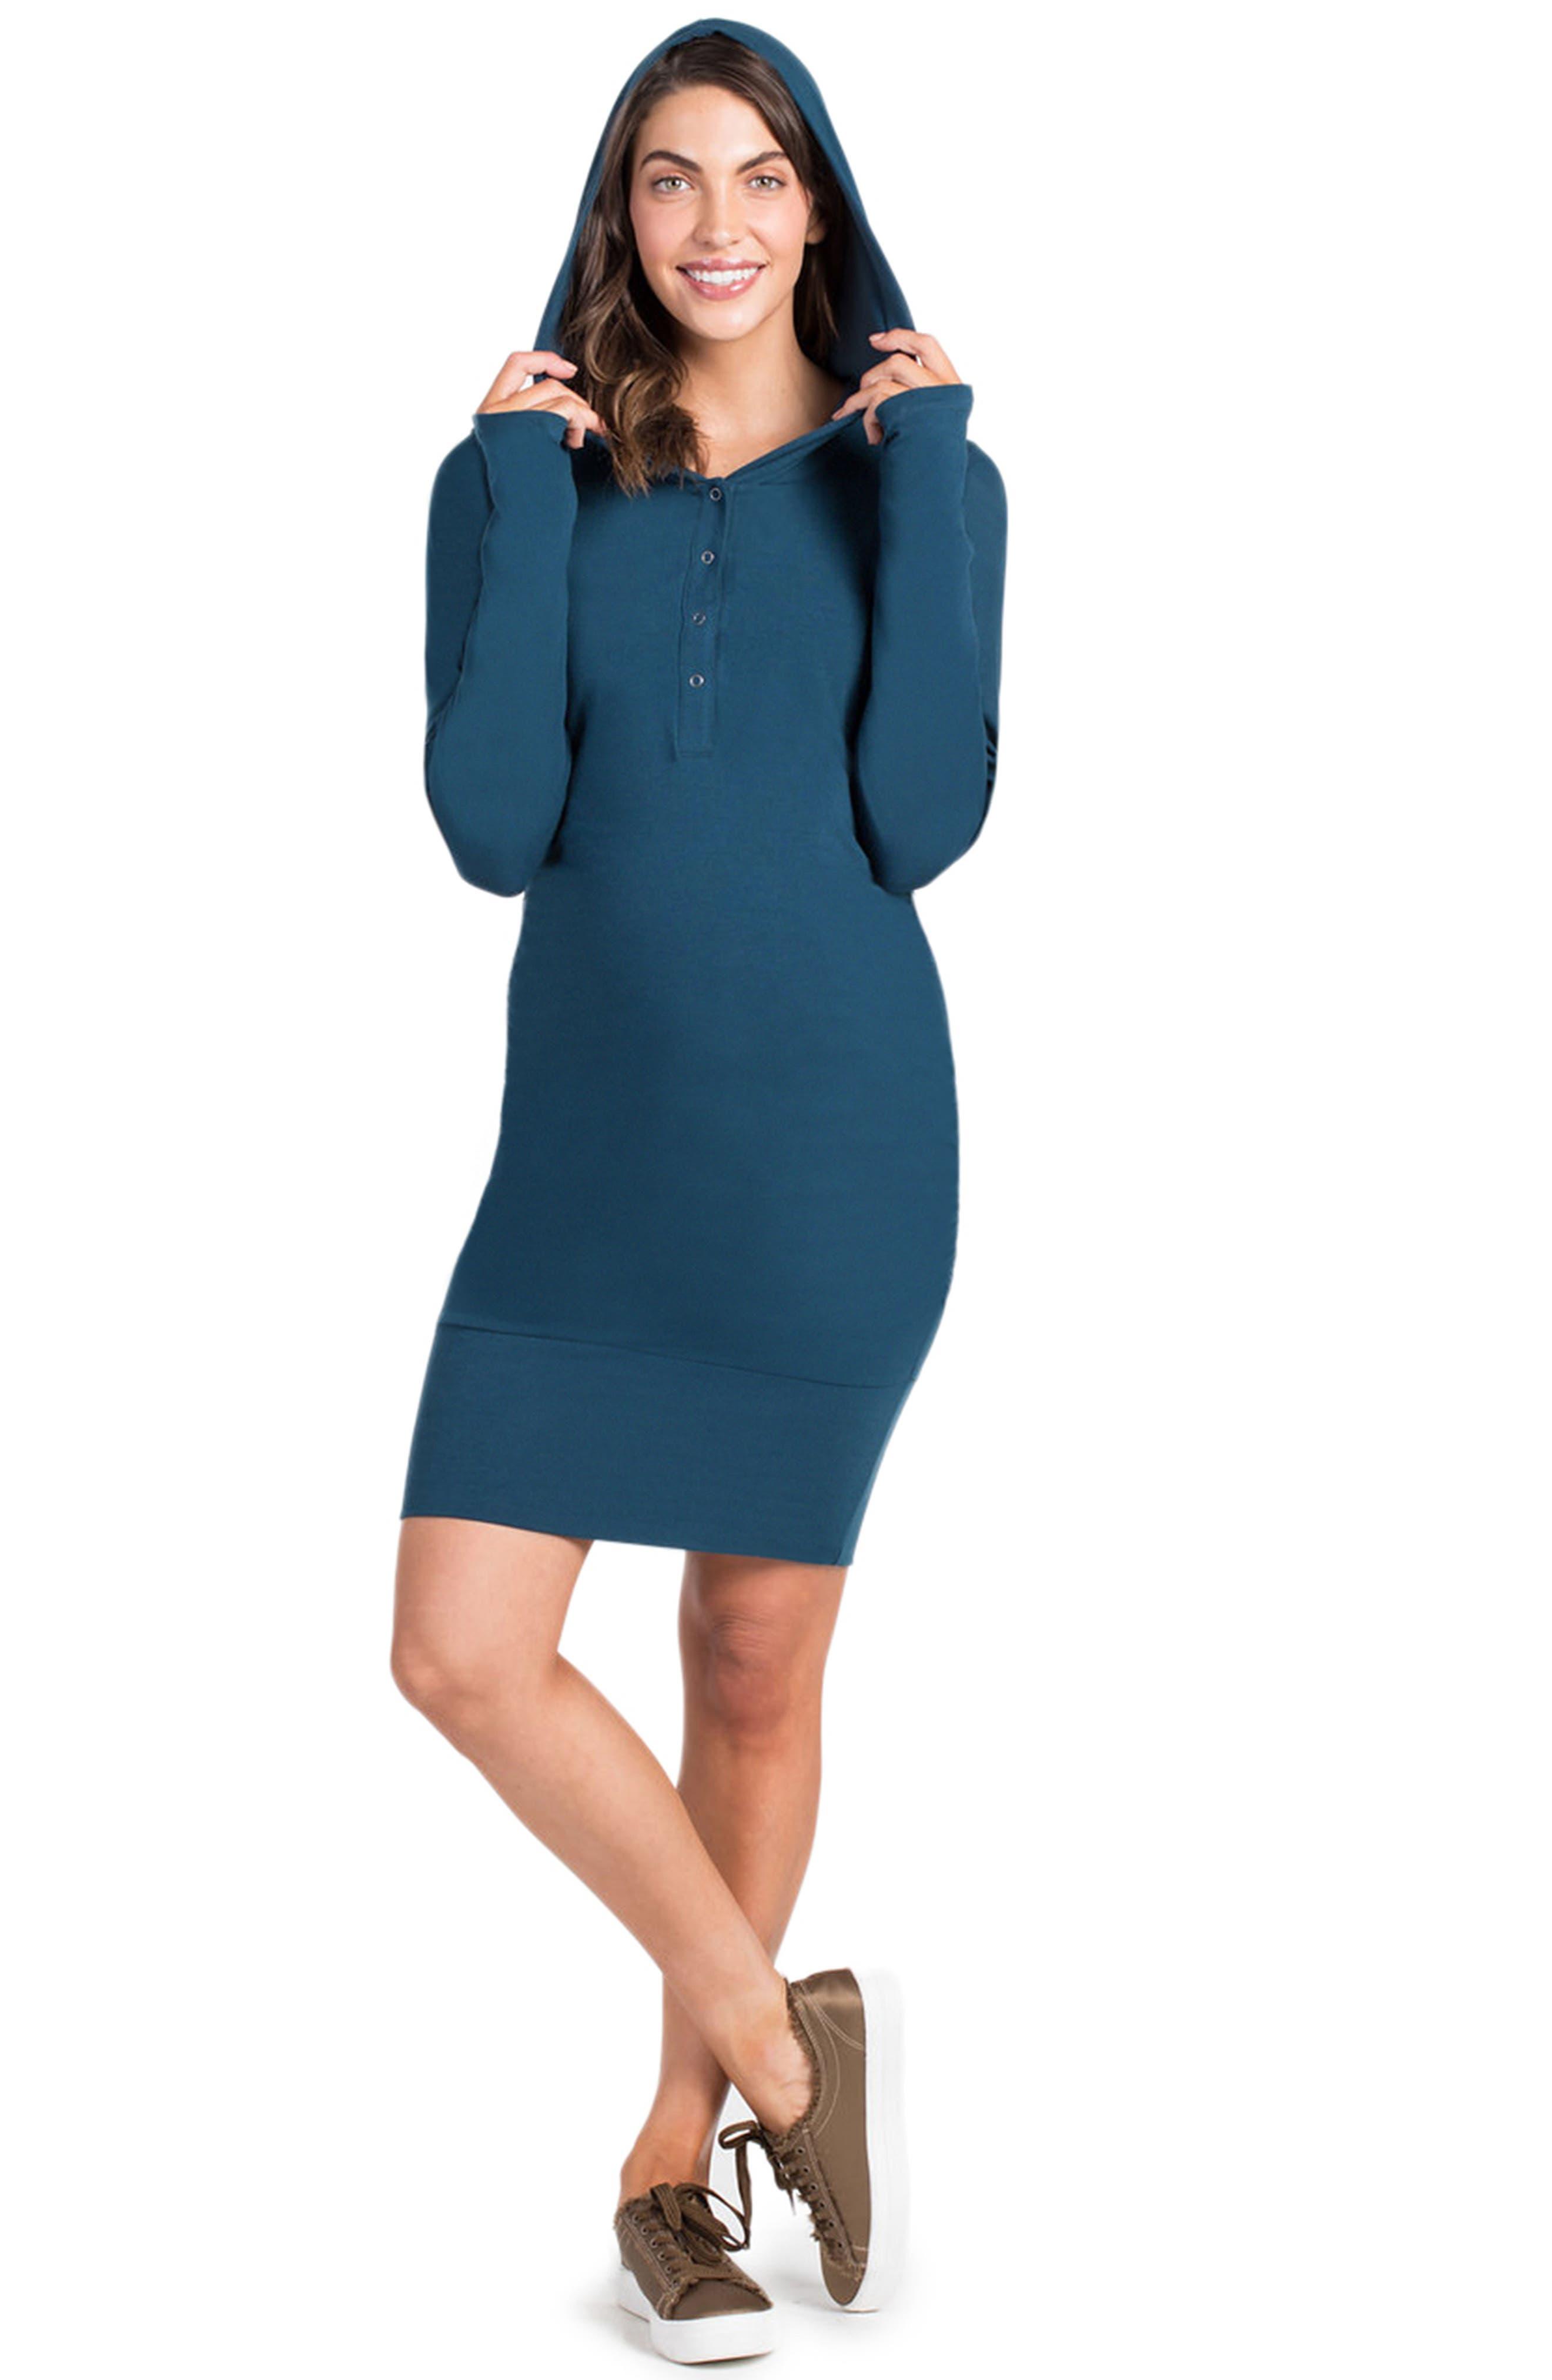 Stella Hoodie Maternity/Nursing Dress,                         Main,                         color, Teal